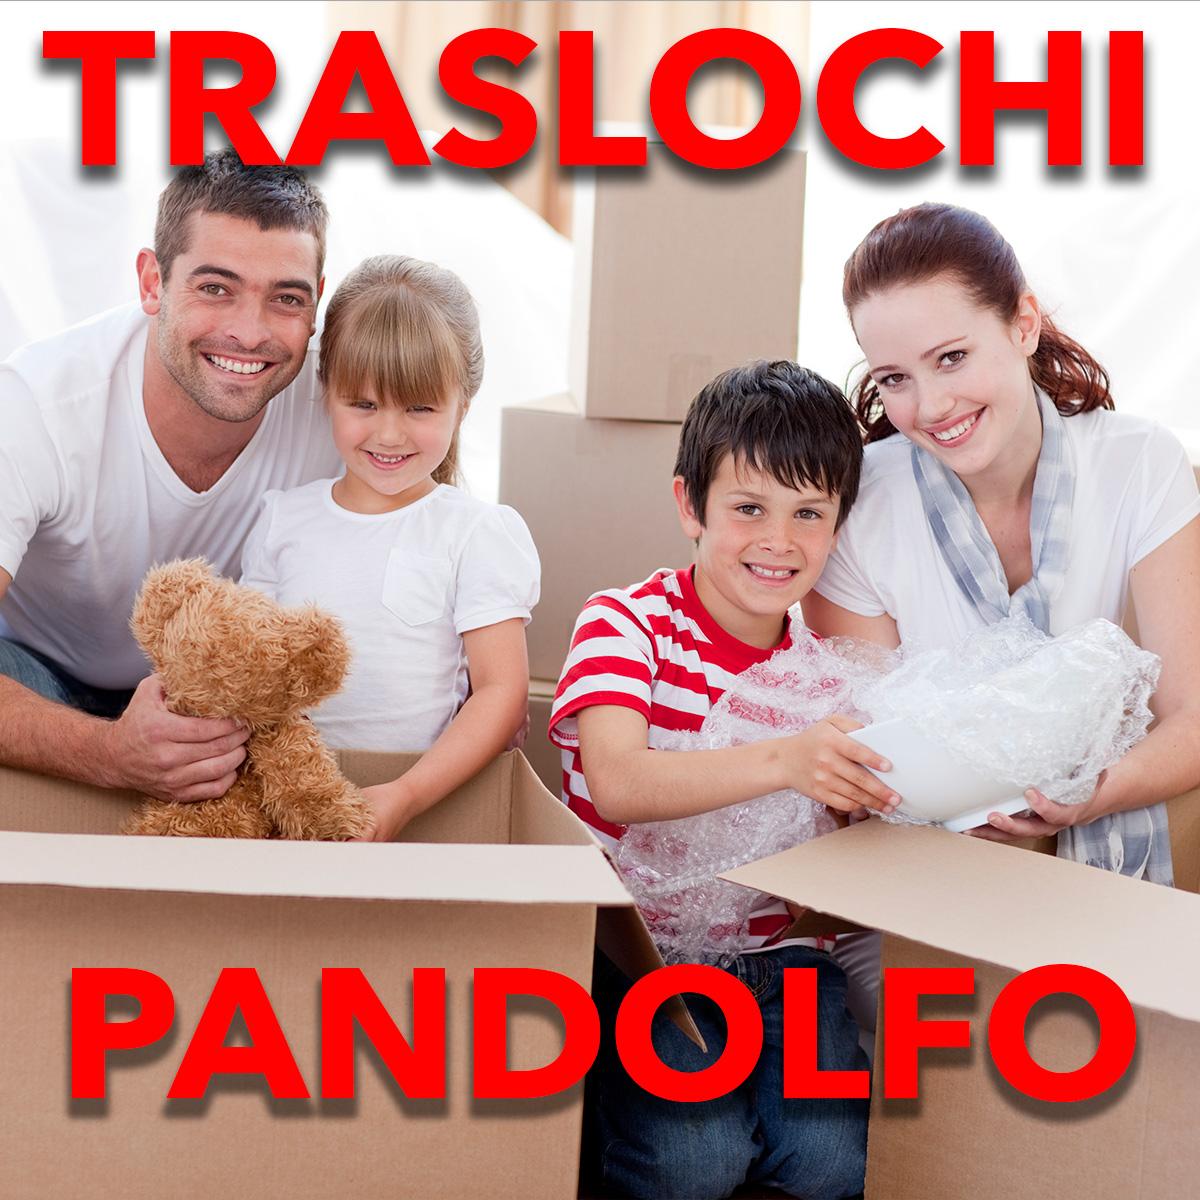 logo x google - Traslochi a savona